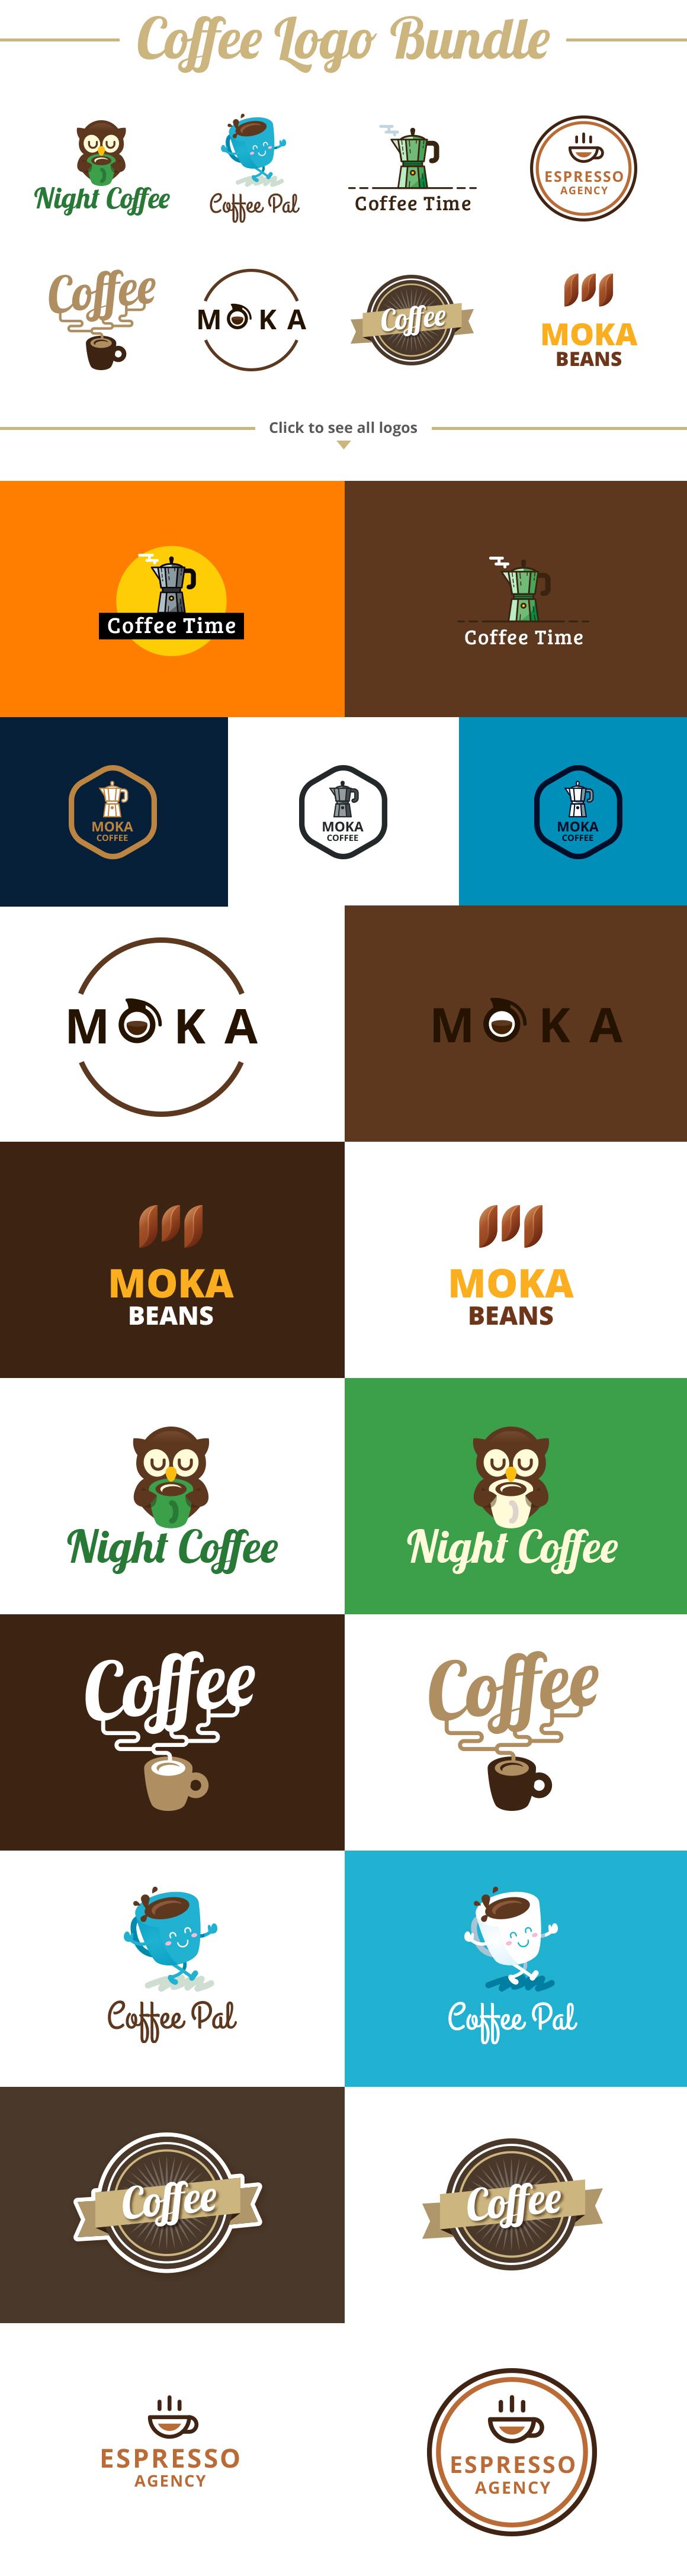 Coffee Logo Template Bundle example image 2